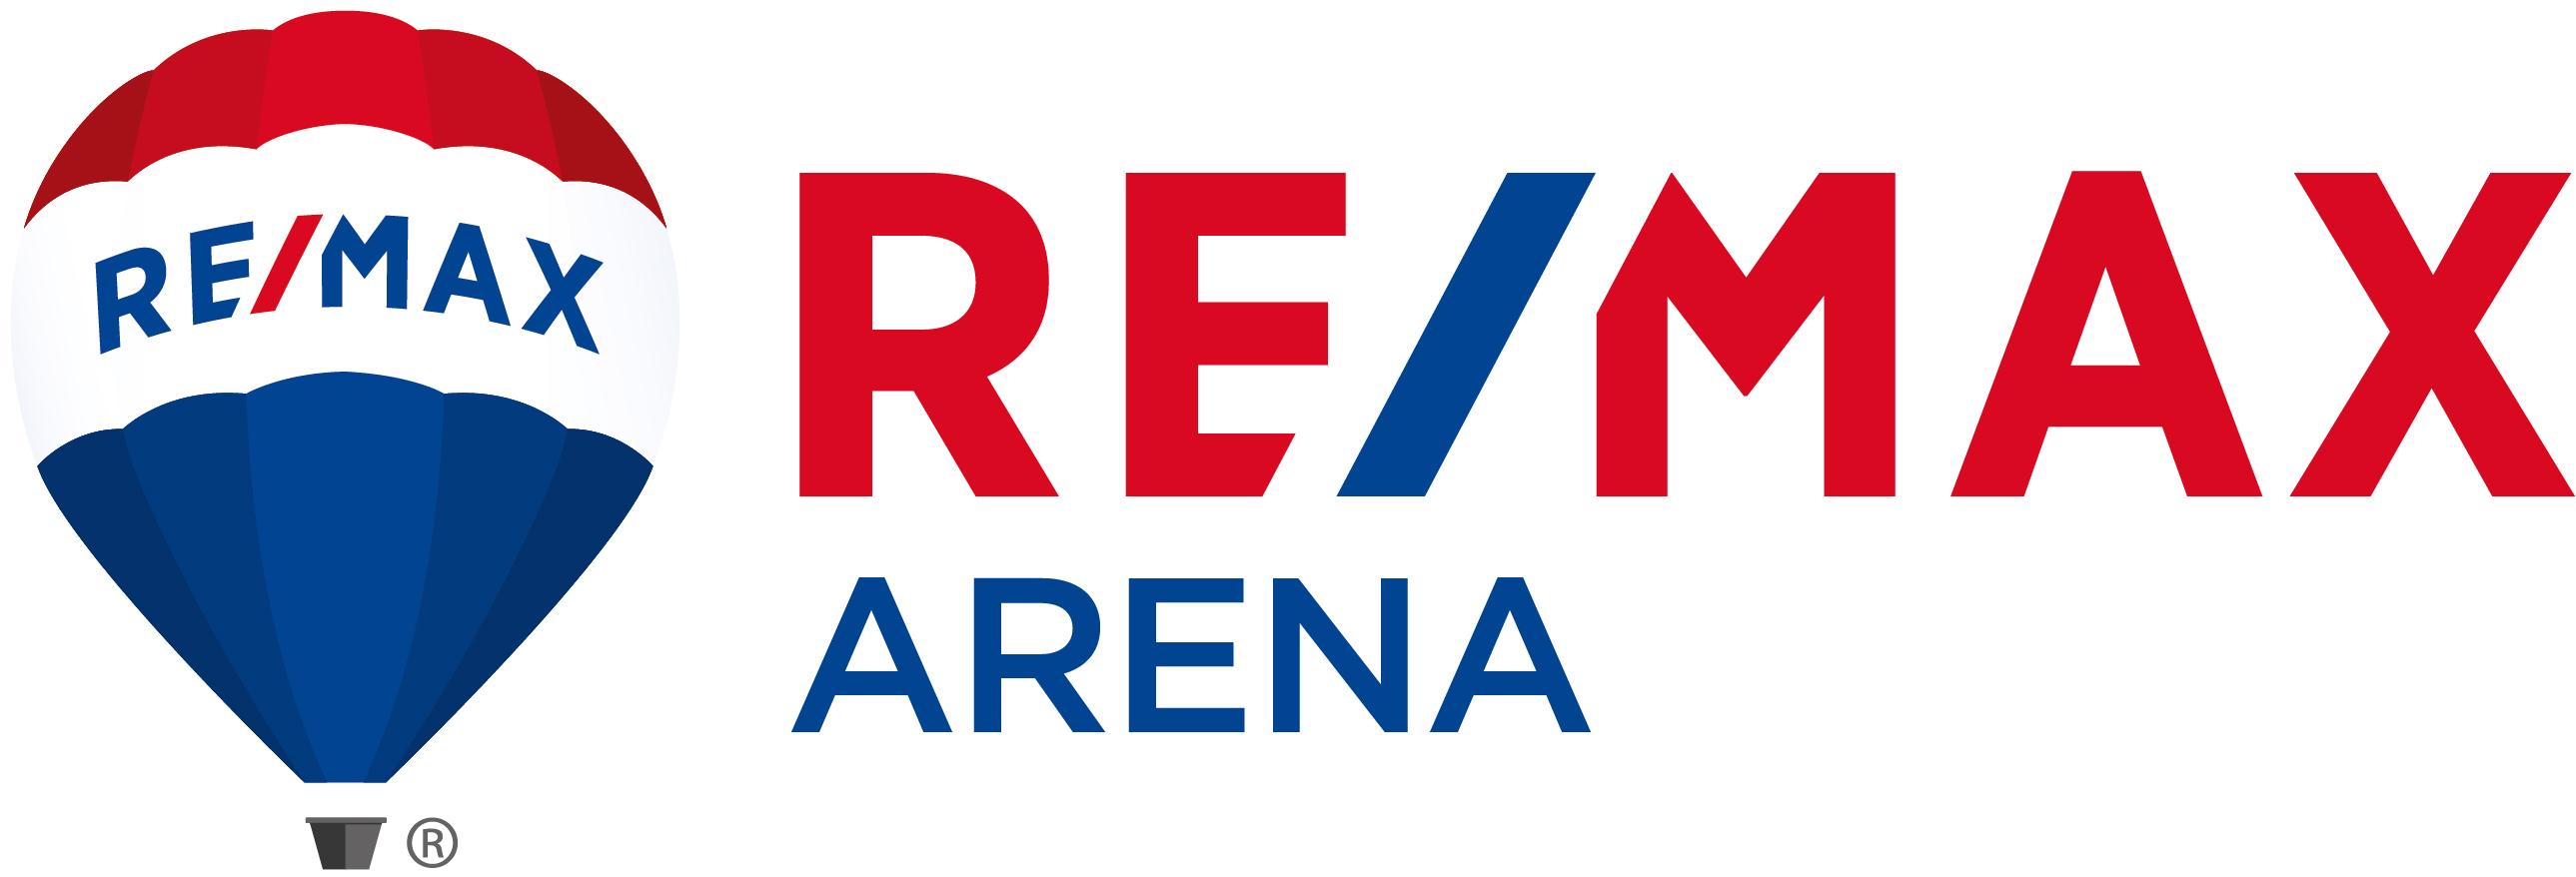 RE/MAX Arena